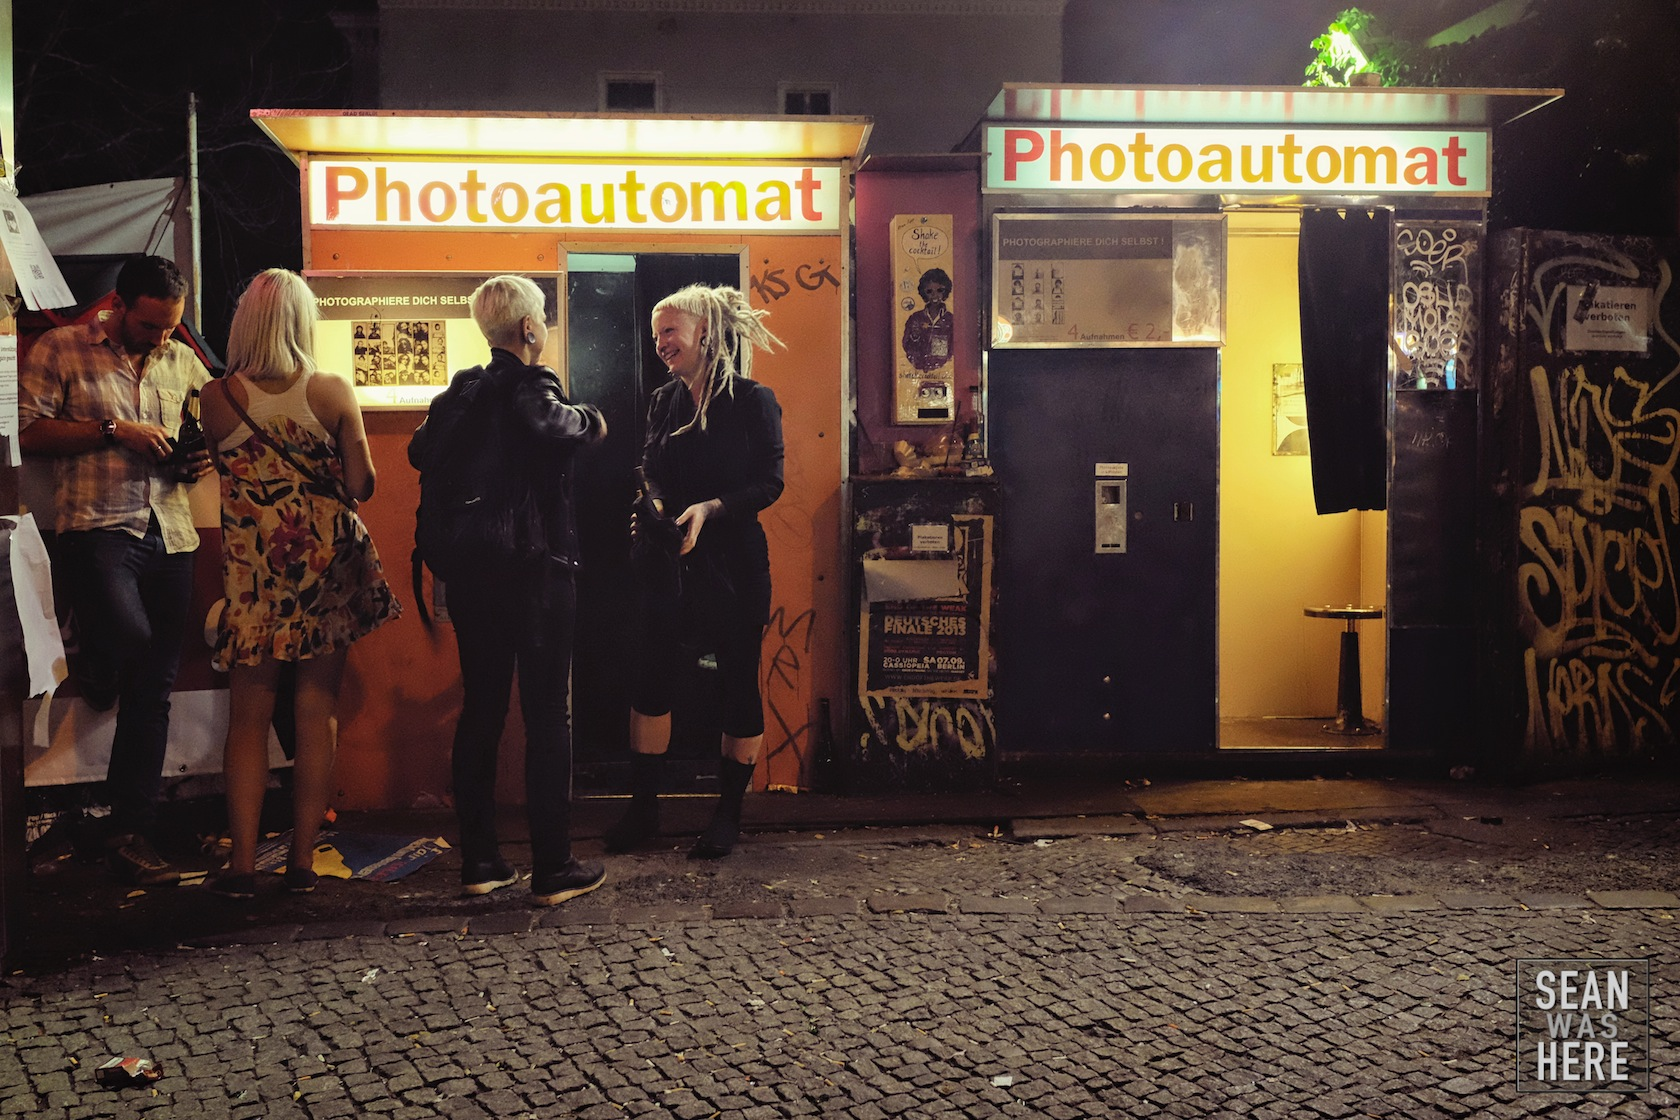 Photoautomat. Kreuzberg, Berlin Germany